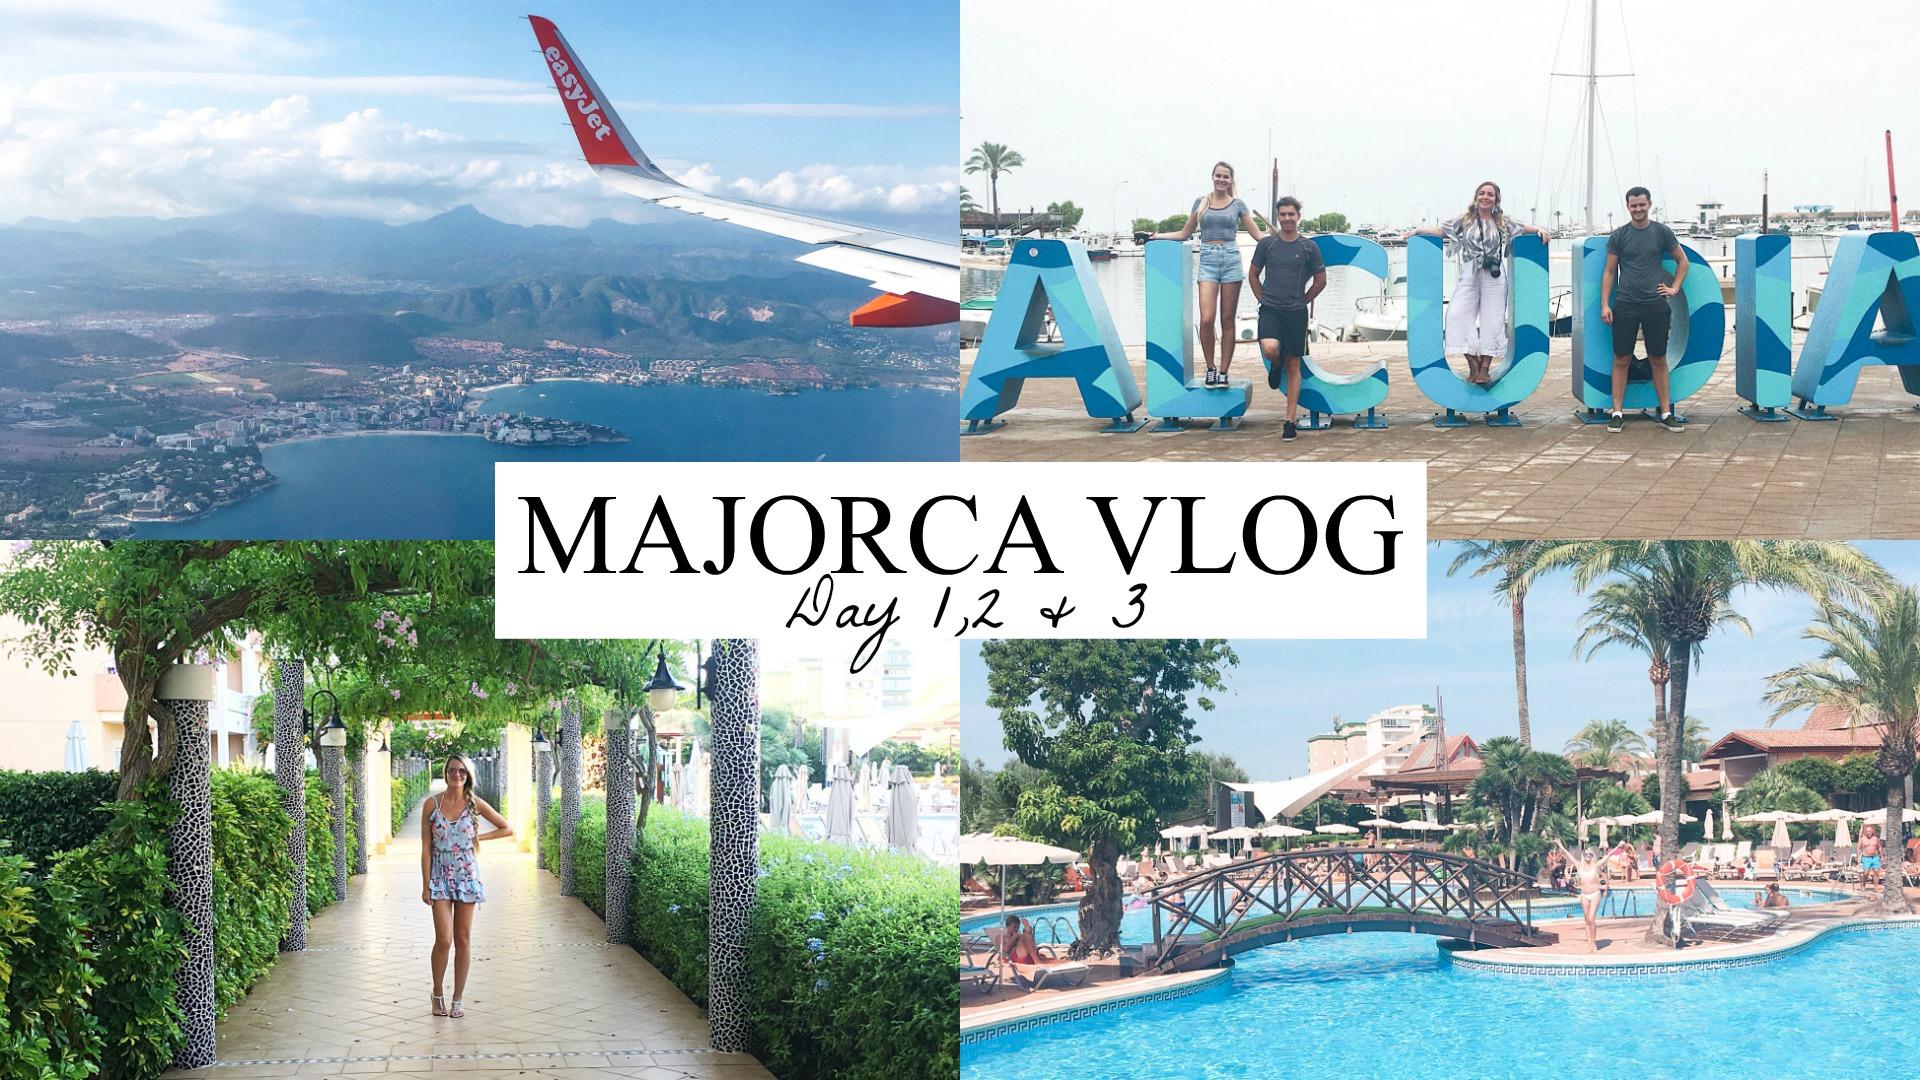 MAJORCA VLOG DAY 1,2 &3 Alcudia, biking & holiday outfits